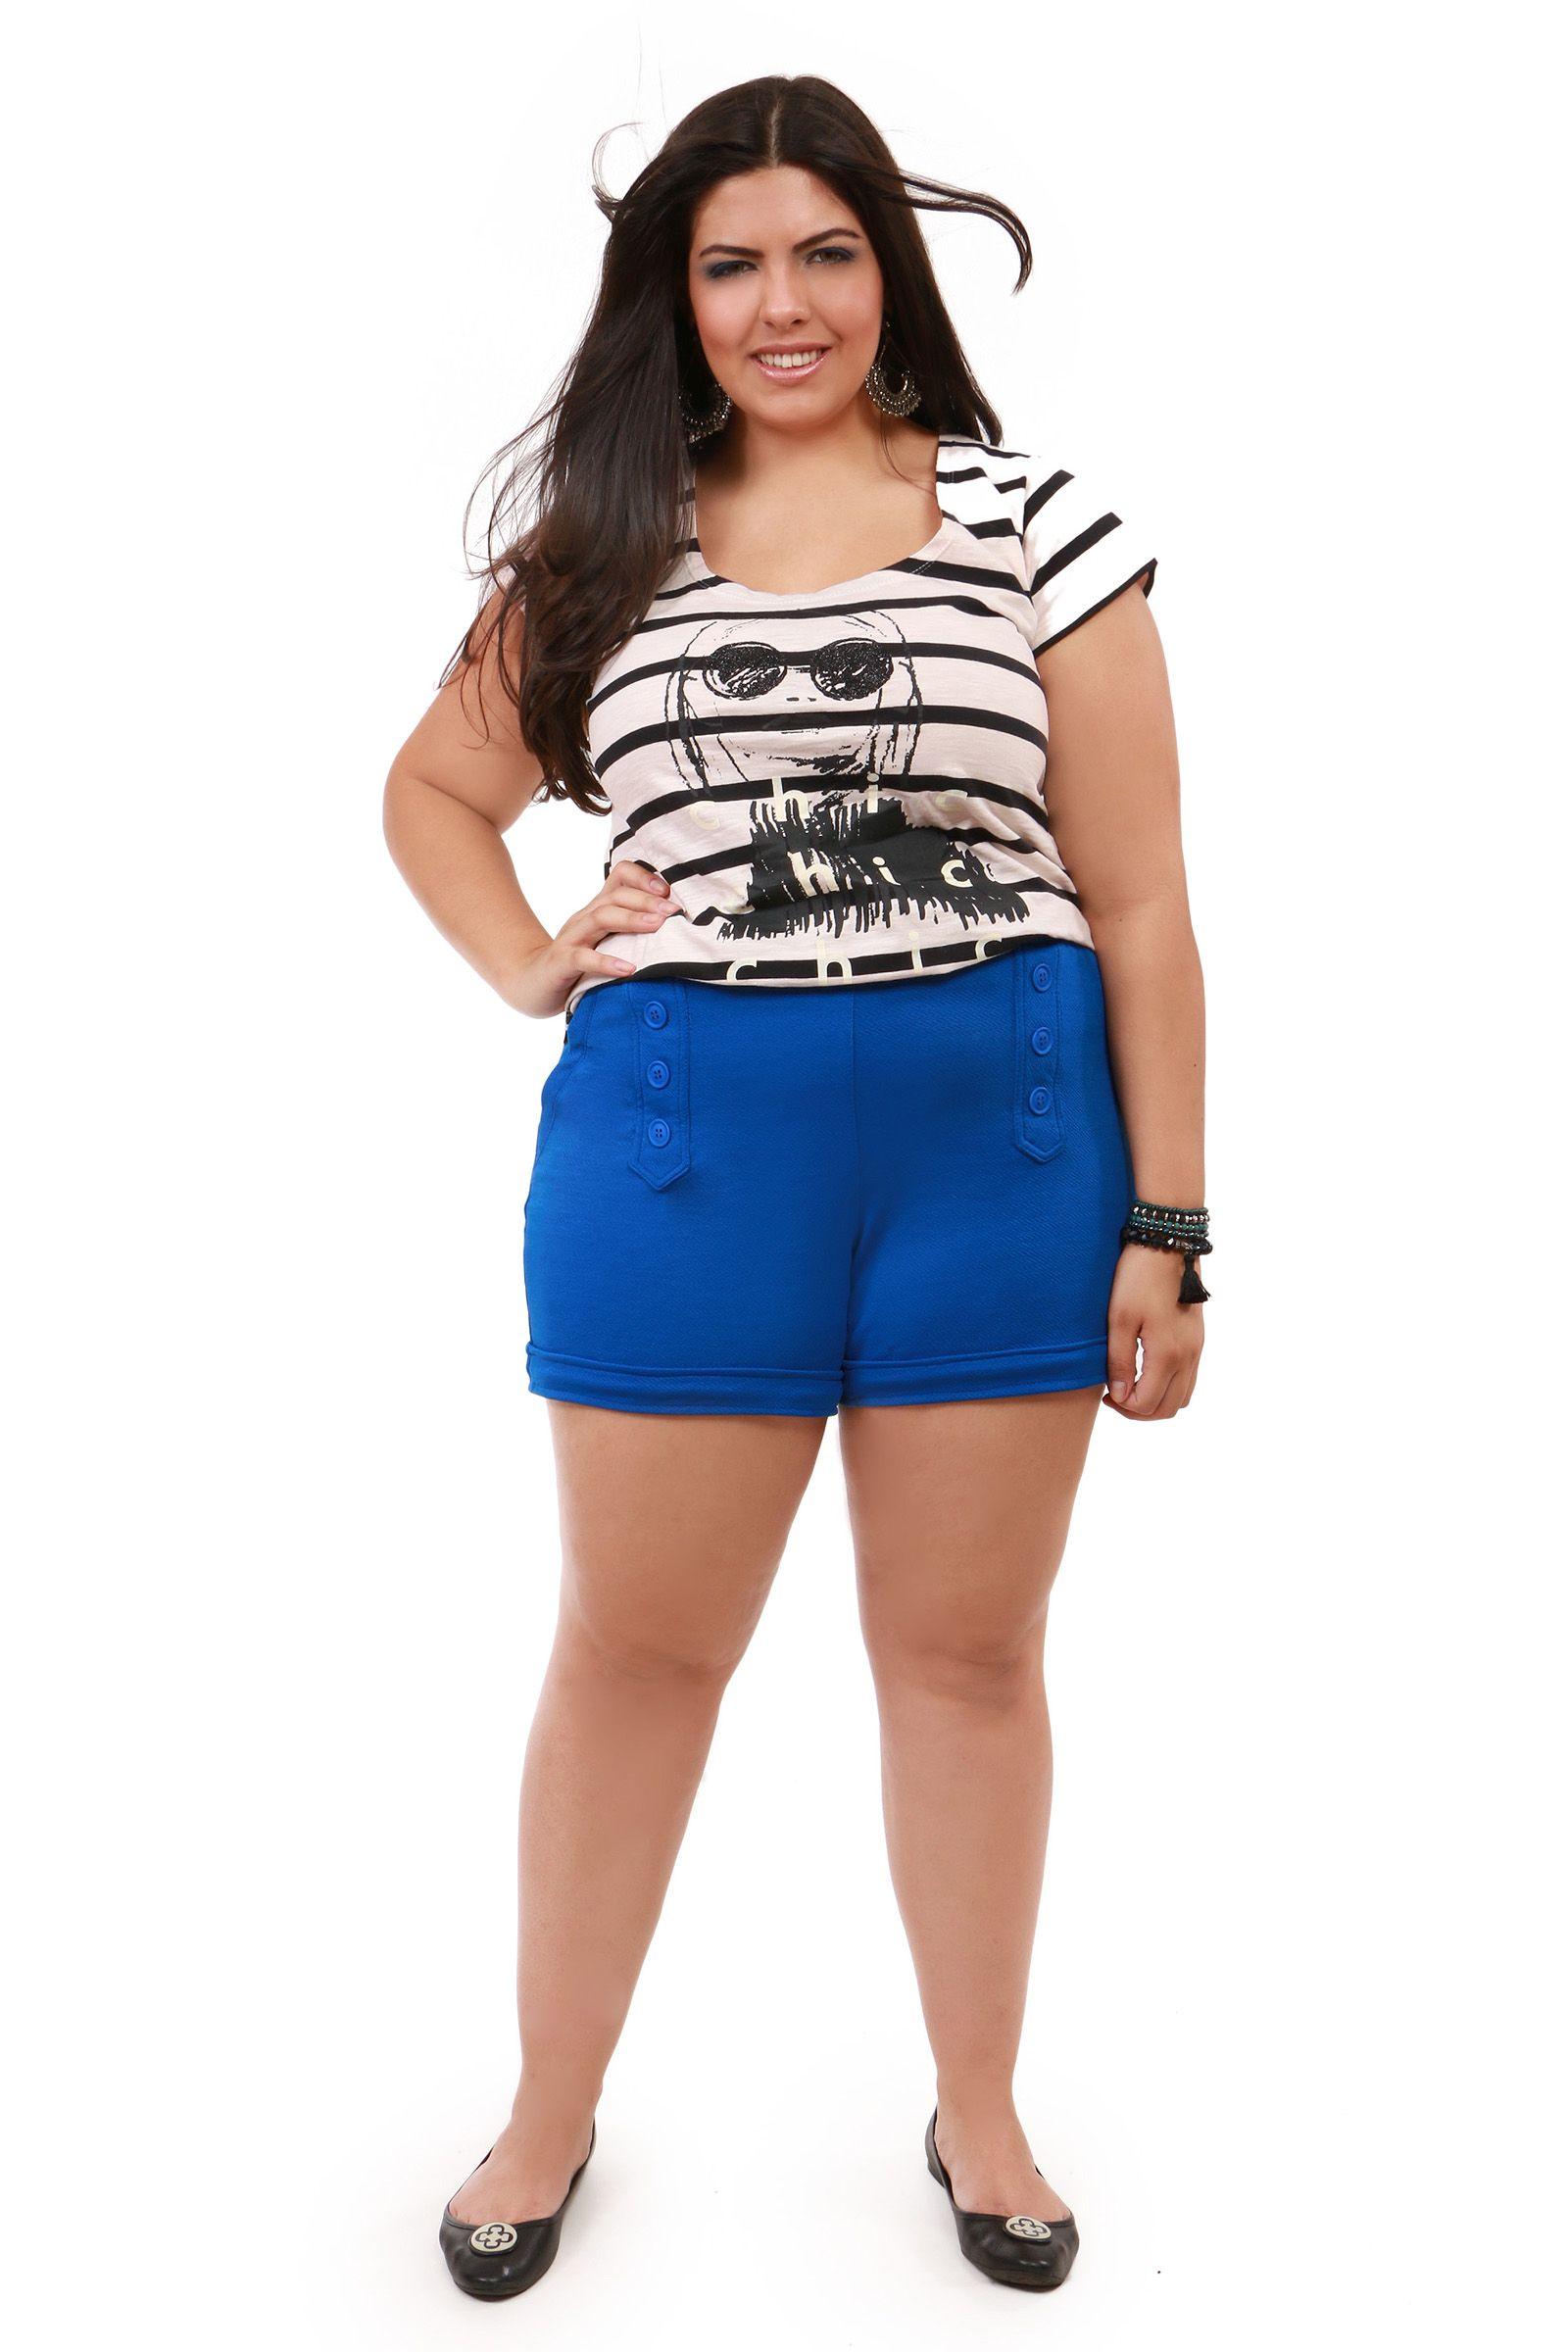 23692406de0f Shorts Malha Plus Size Kauê   Moda Plus Size -Shorts em alta kauê ...